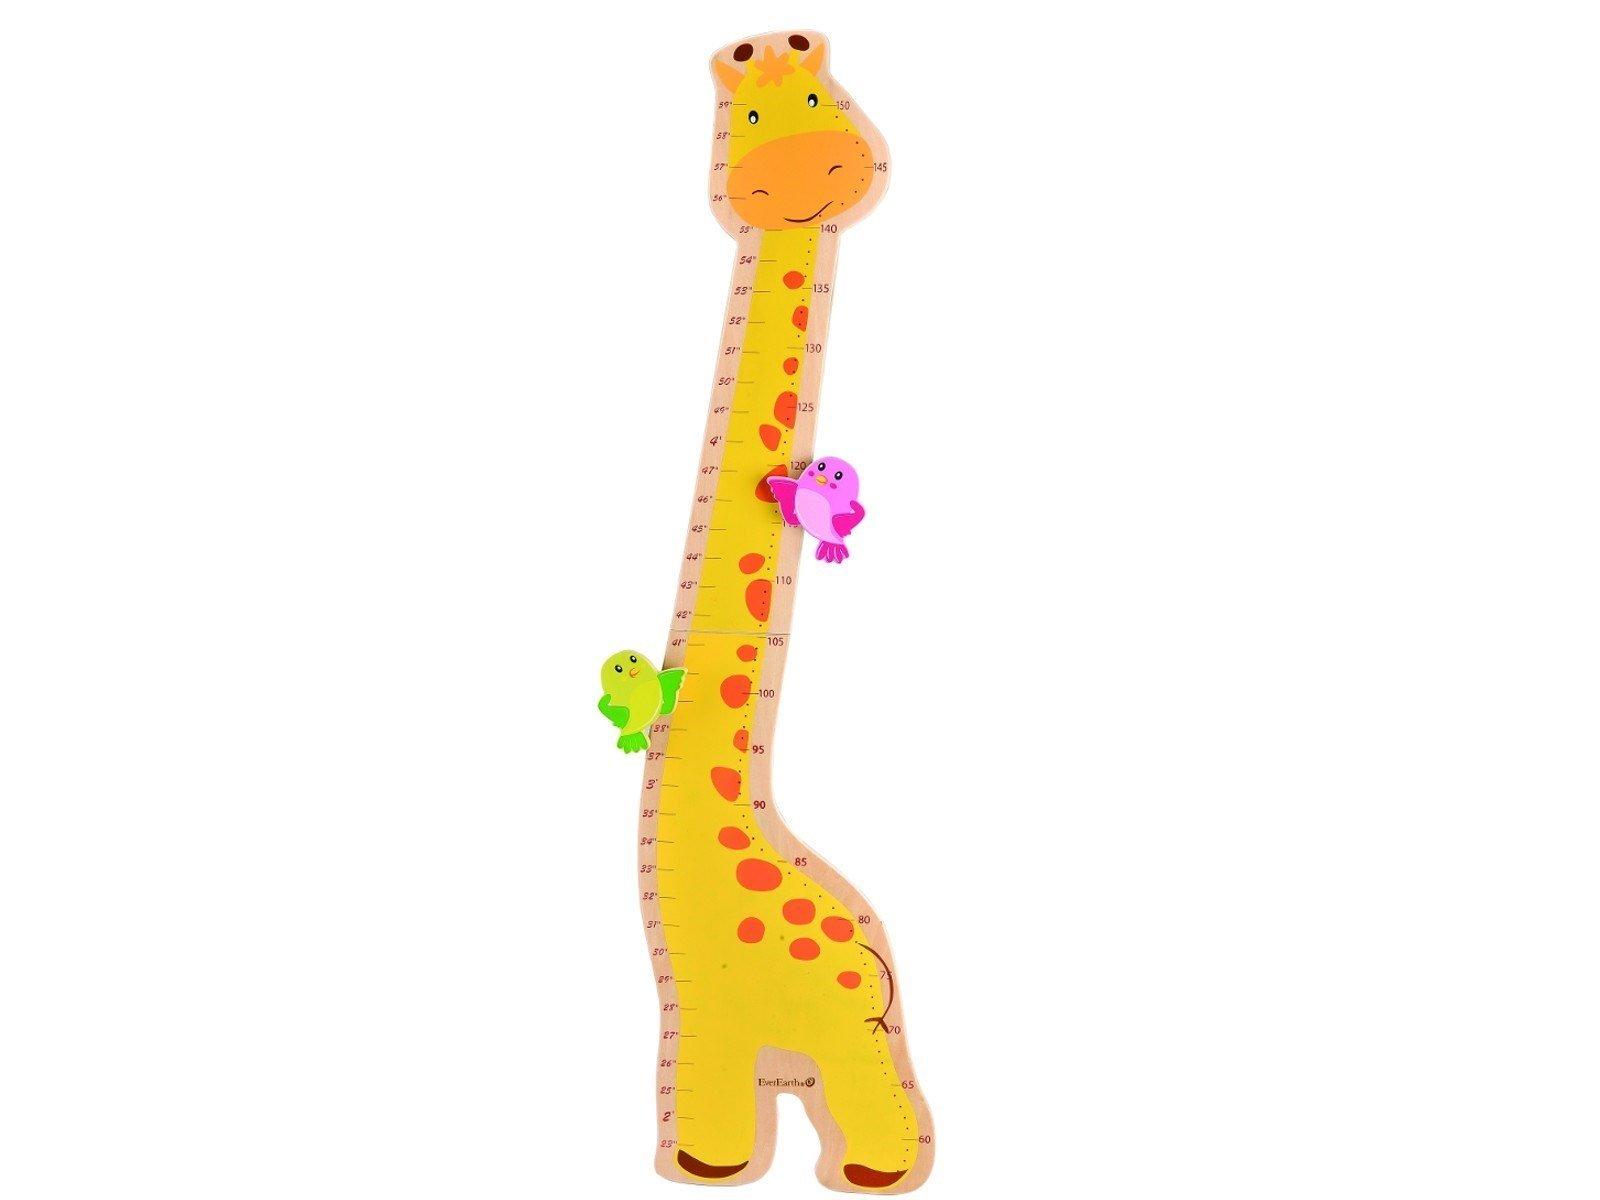 Full Size of Everearth Messlatte Kind Giraffe Aus Holz Regal Kinderzimmer Weiß Regale Sofa Kinderzimmer Messlatte Kinderzimmer